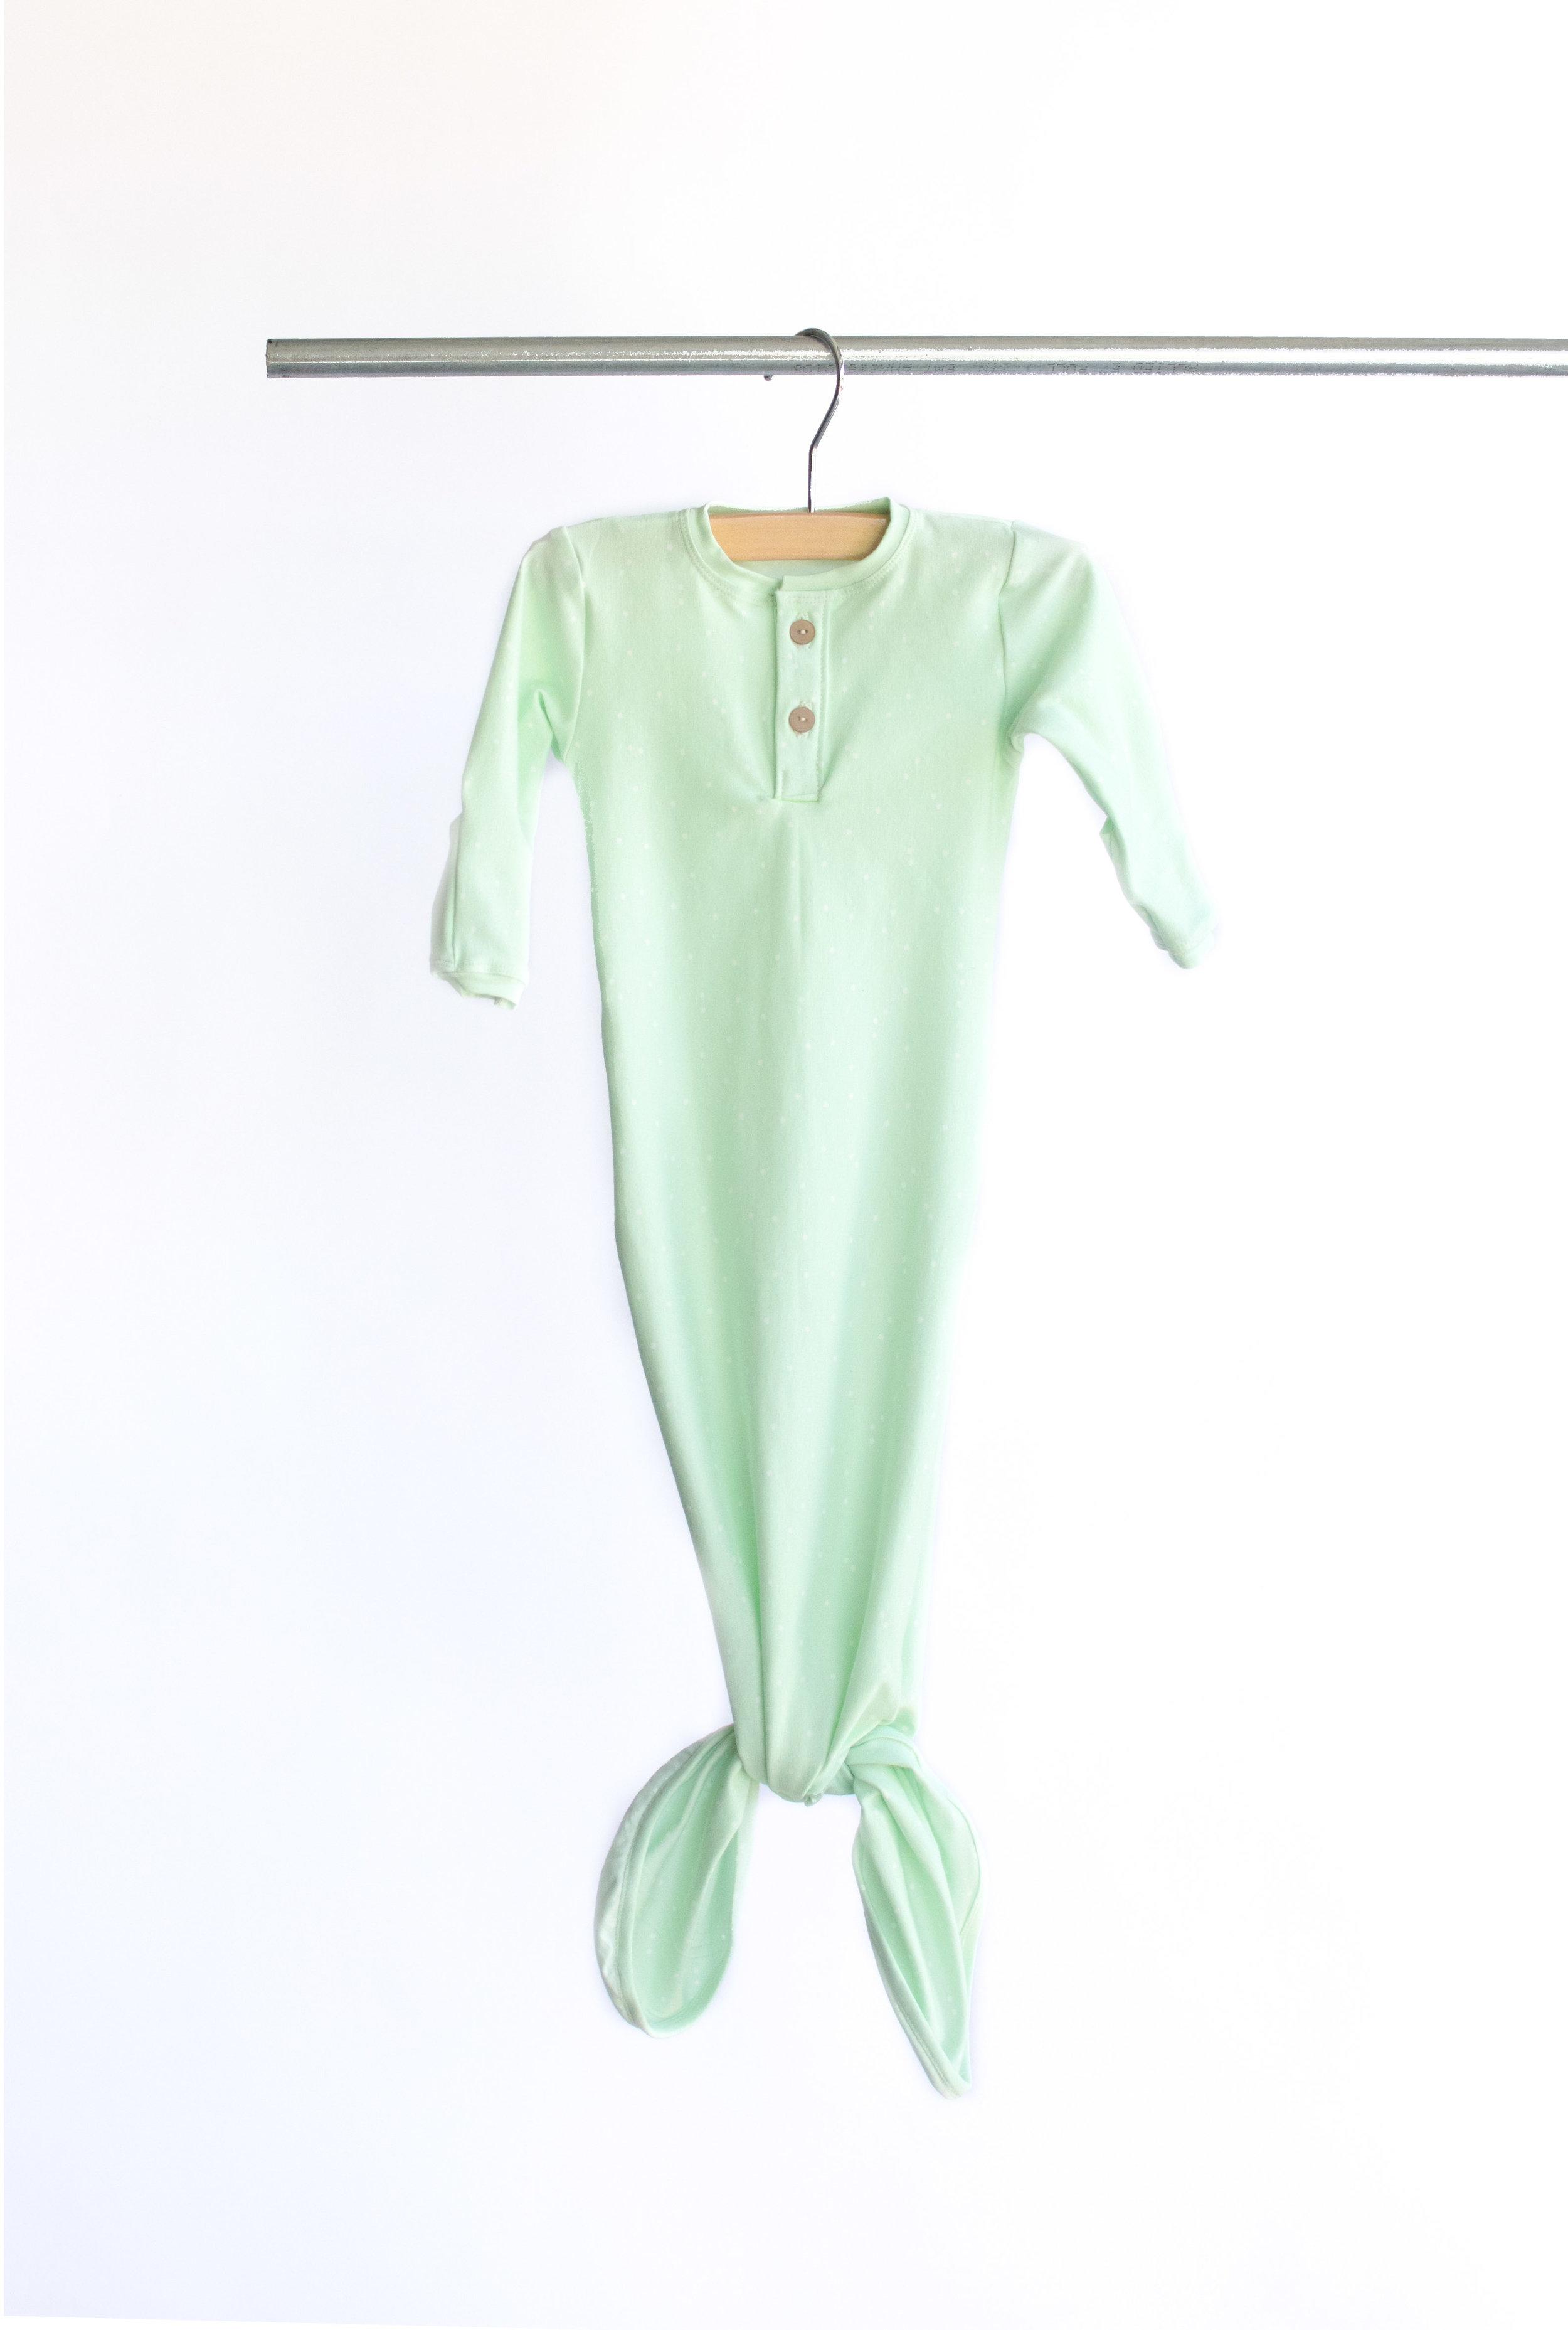 gown8.jpg